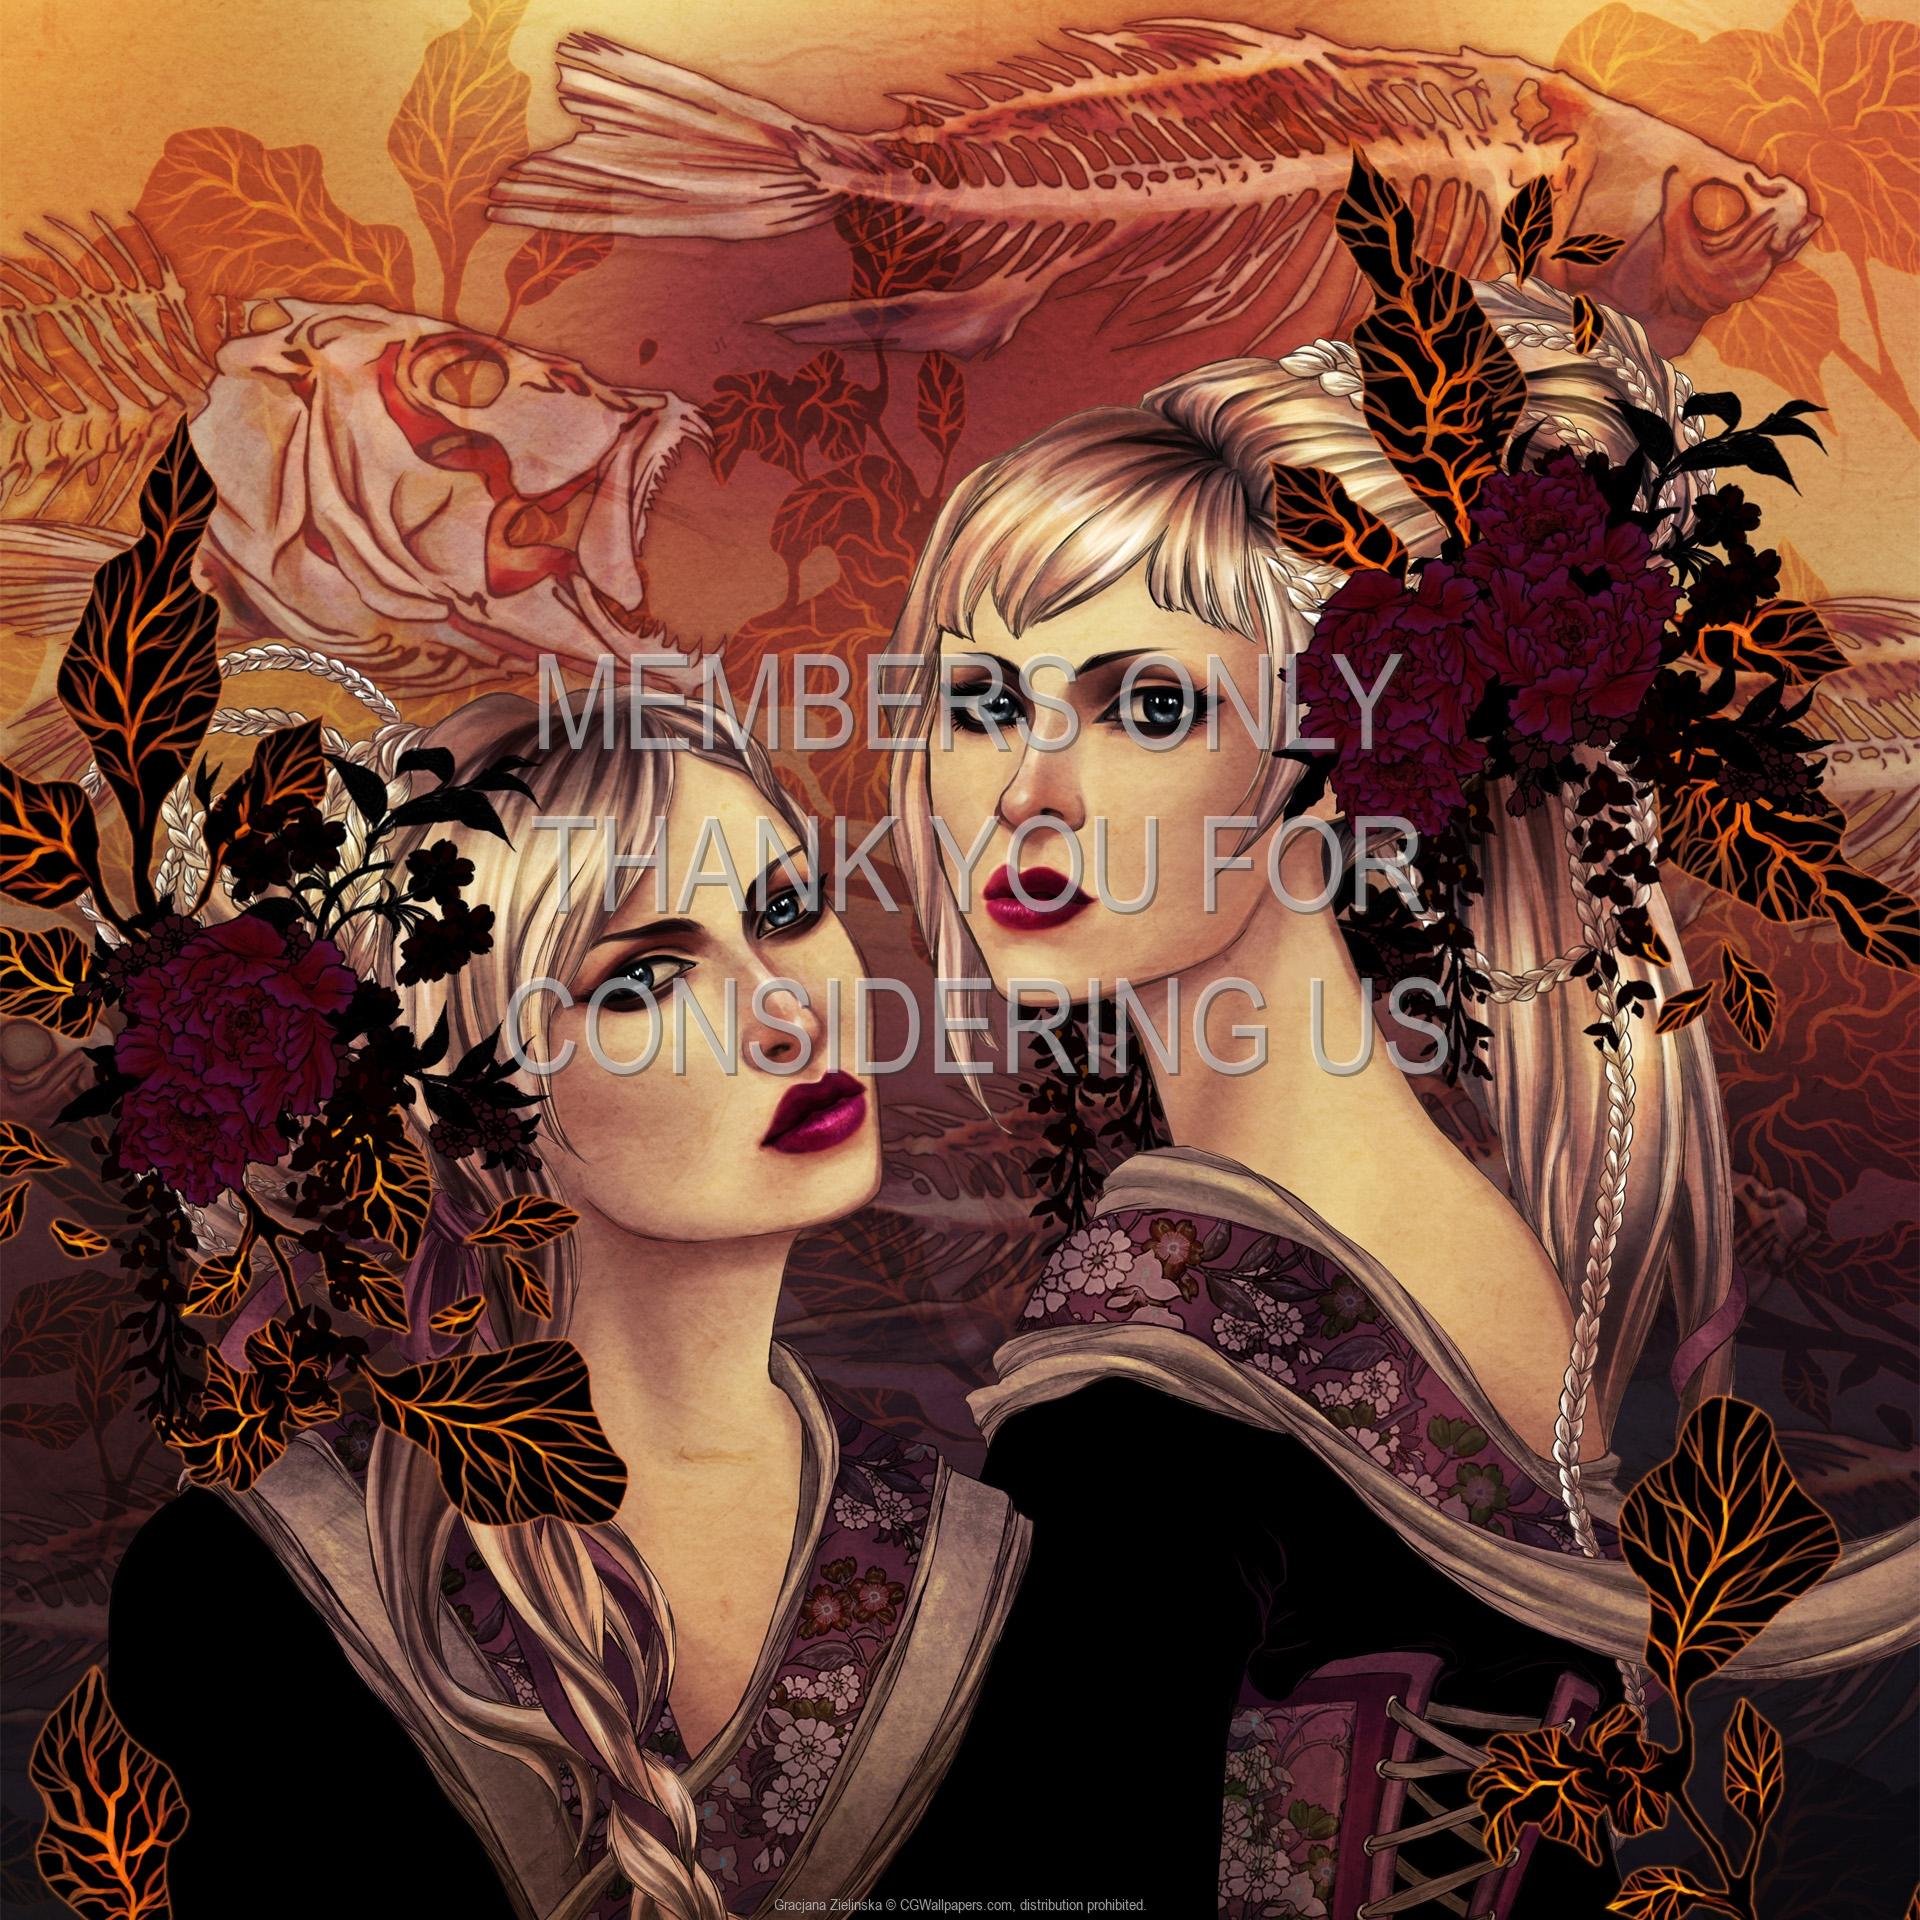 Gracjana Zielinska 1920x1080 Mobile wallpaper or background 07